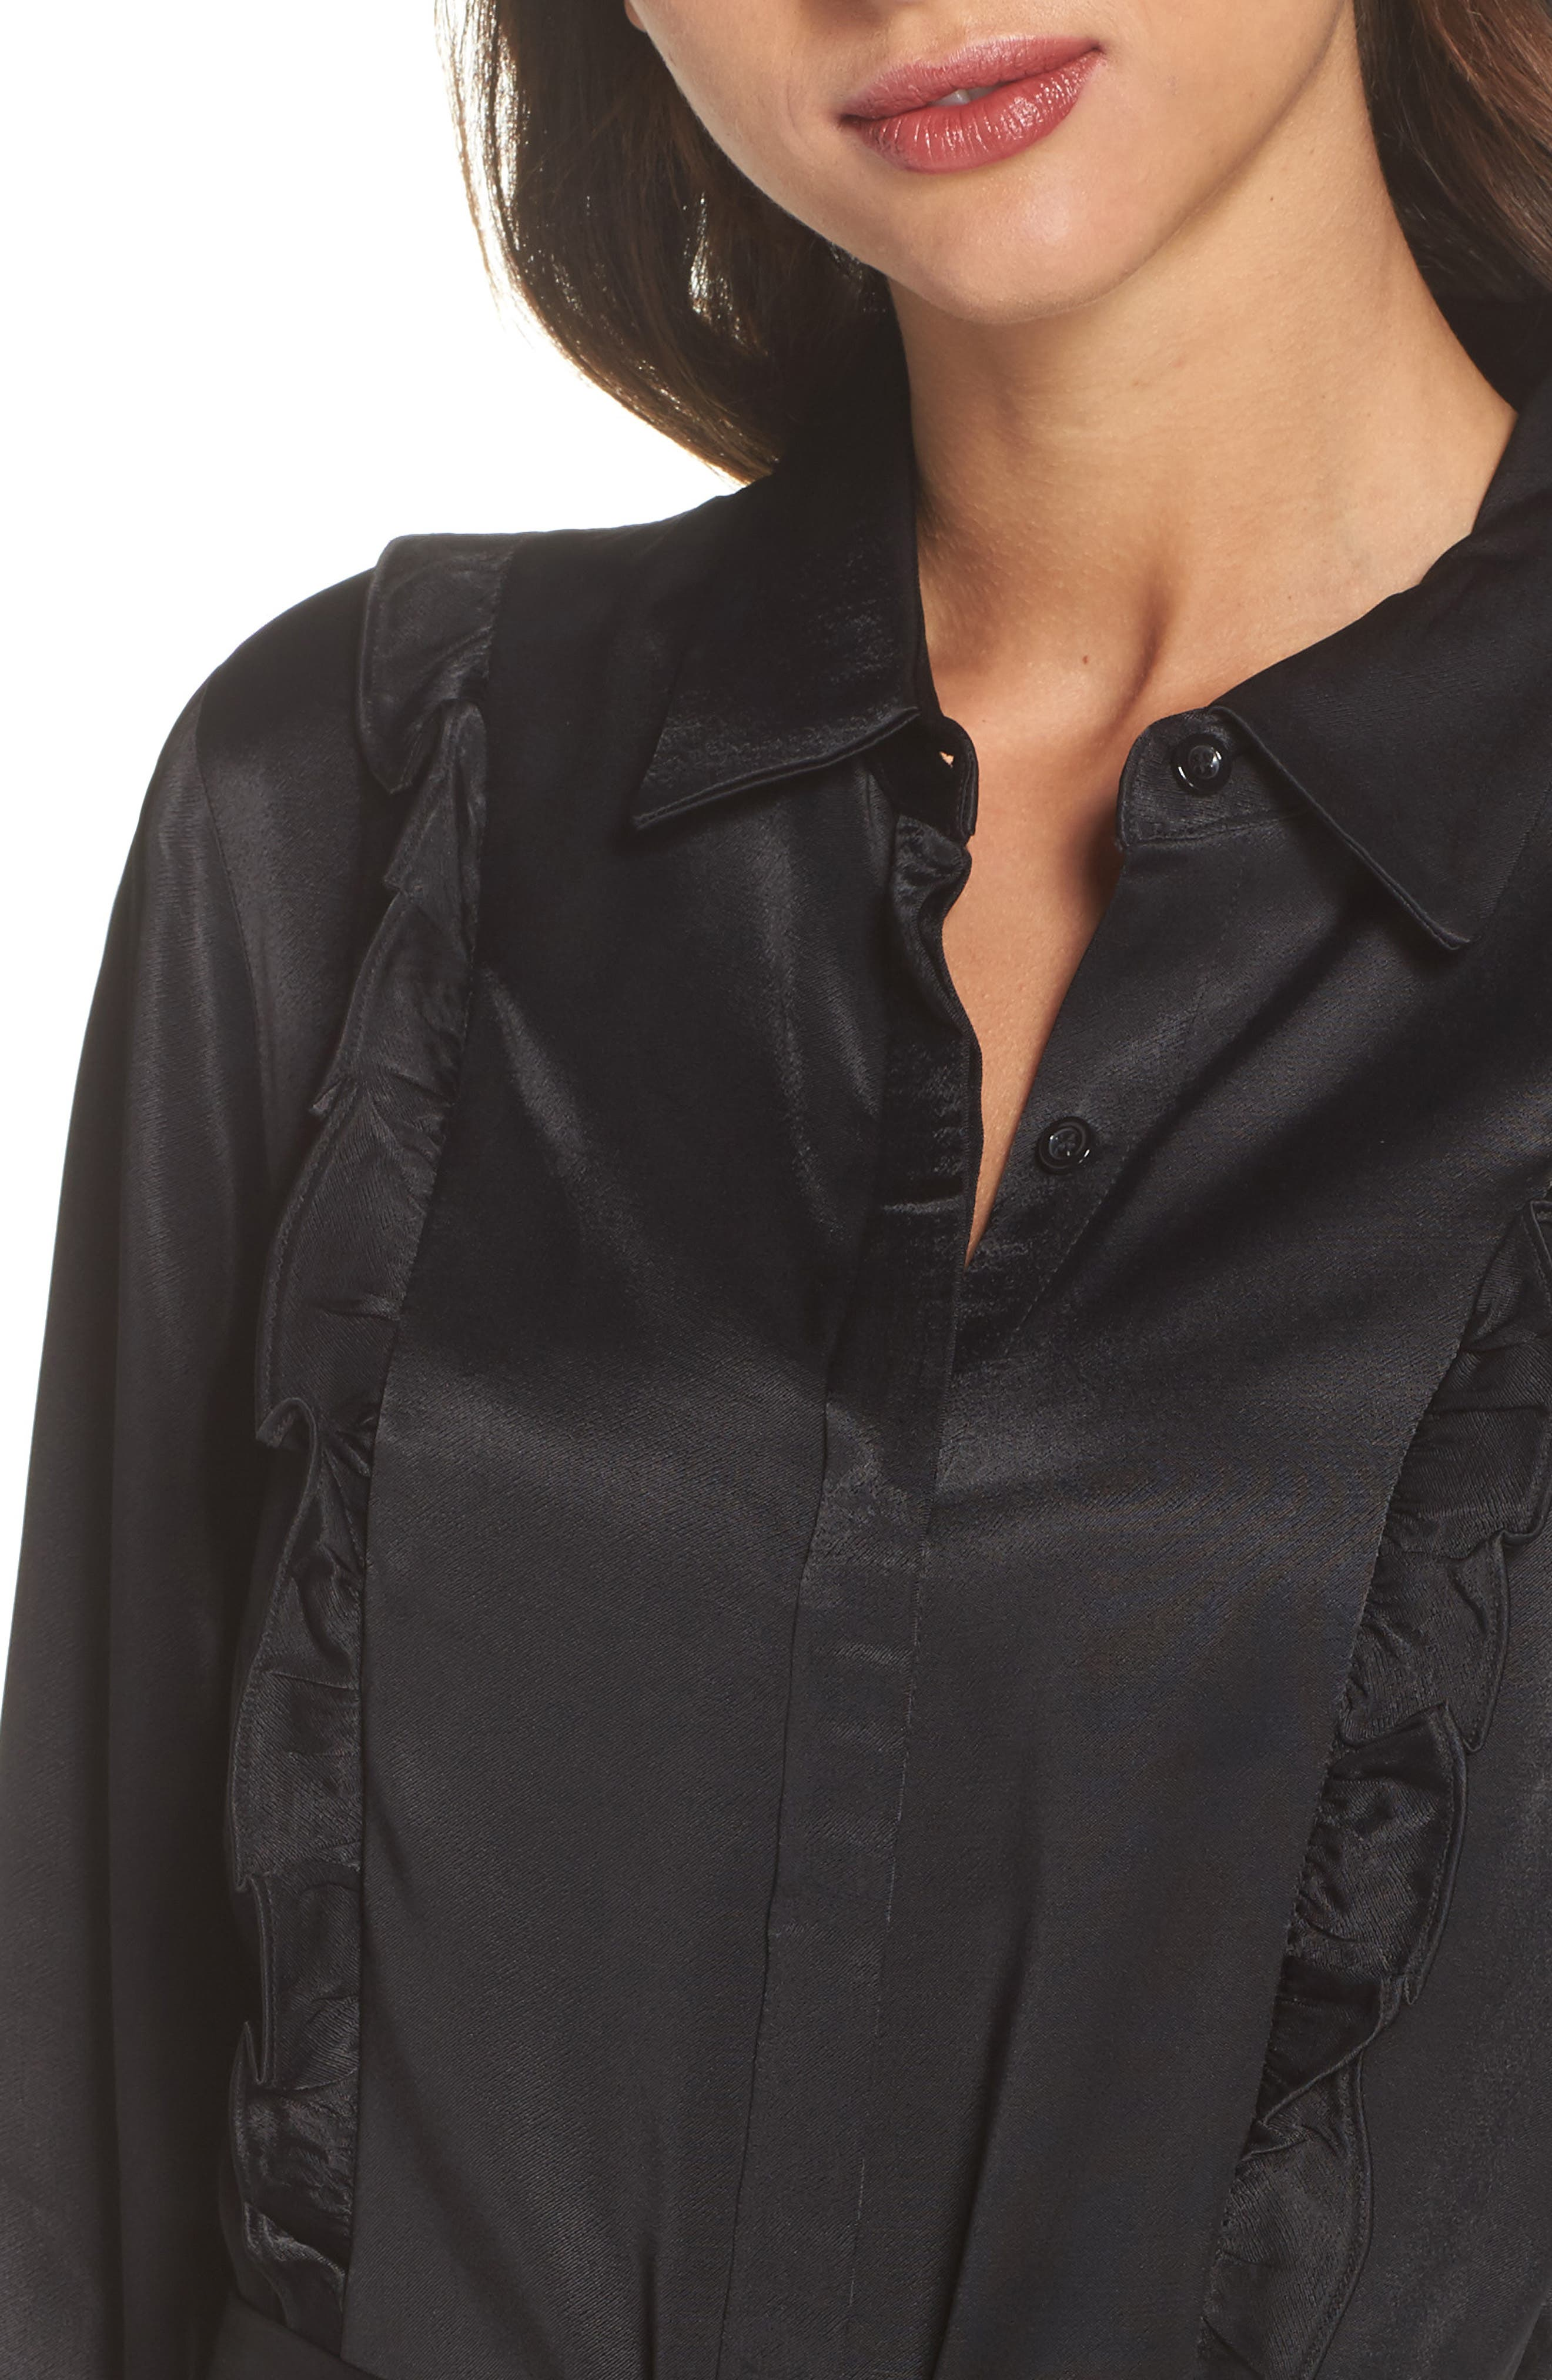 Cassia Ruffle Trim Shirtdress,                             Alternate thumbnail 4, color,